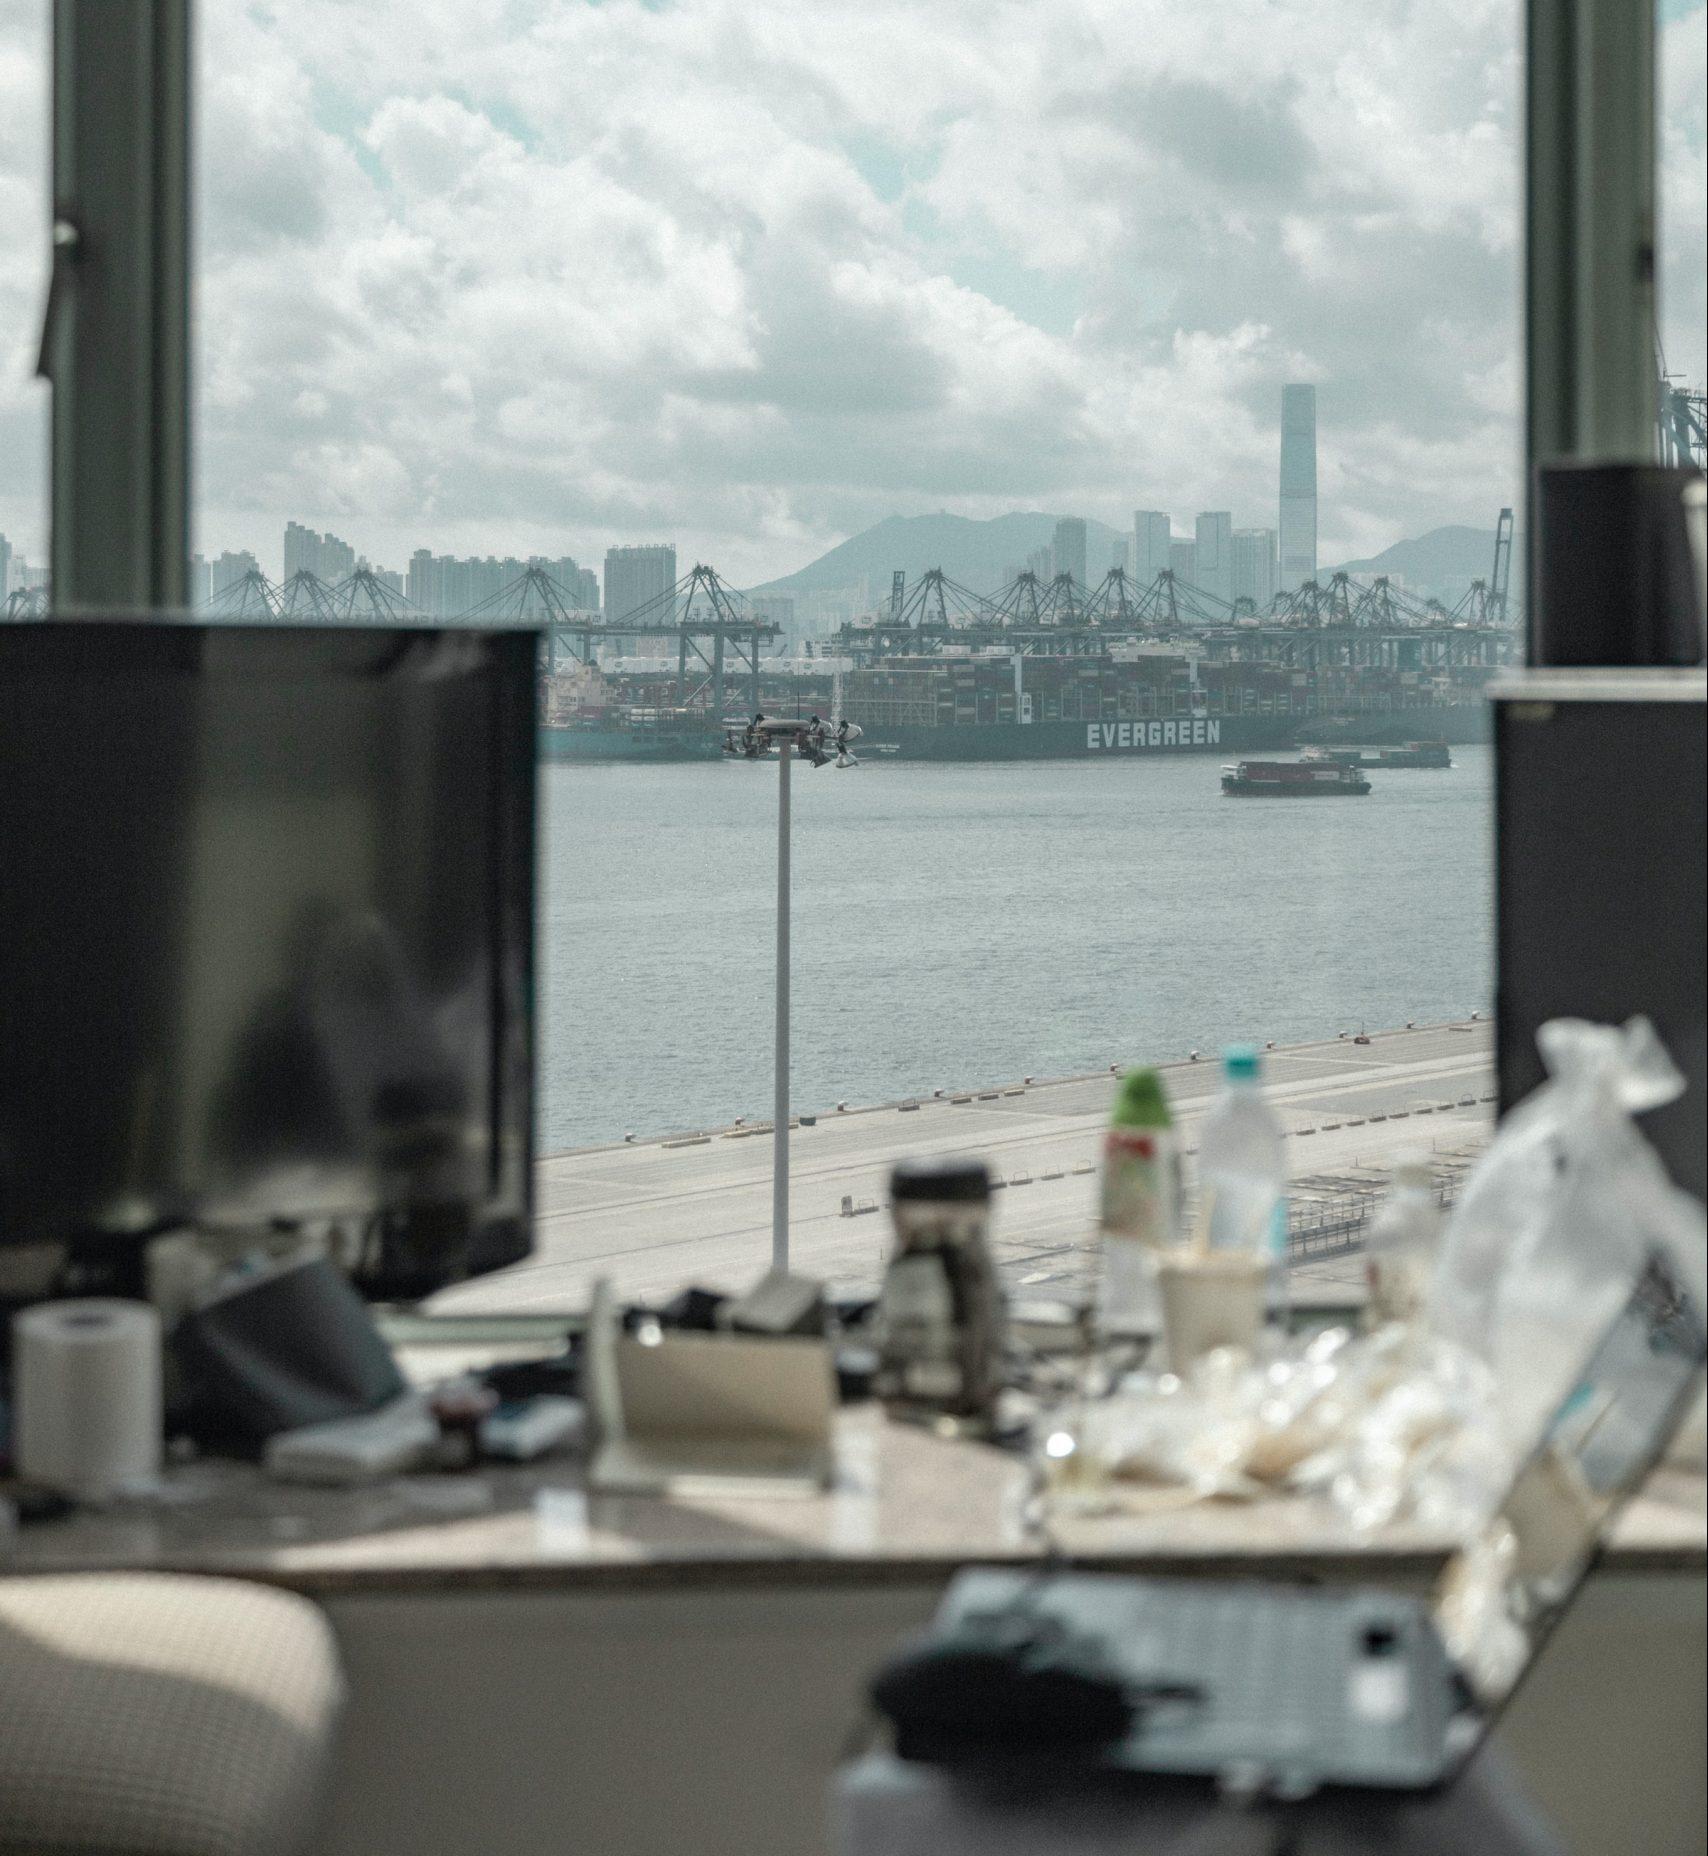 hotel quarantine view from window